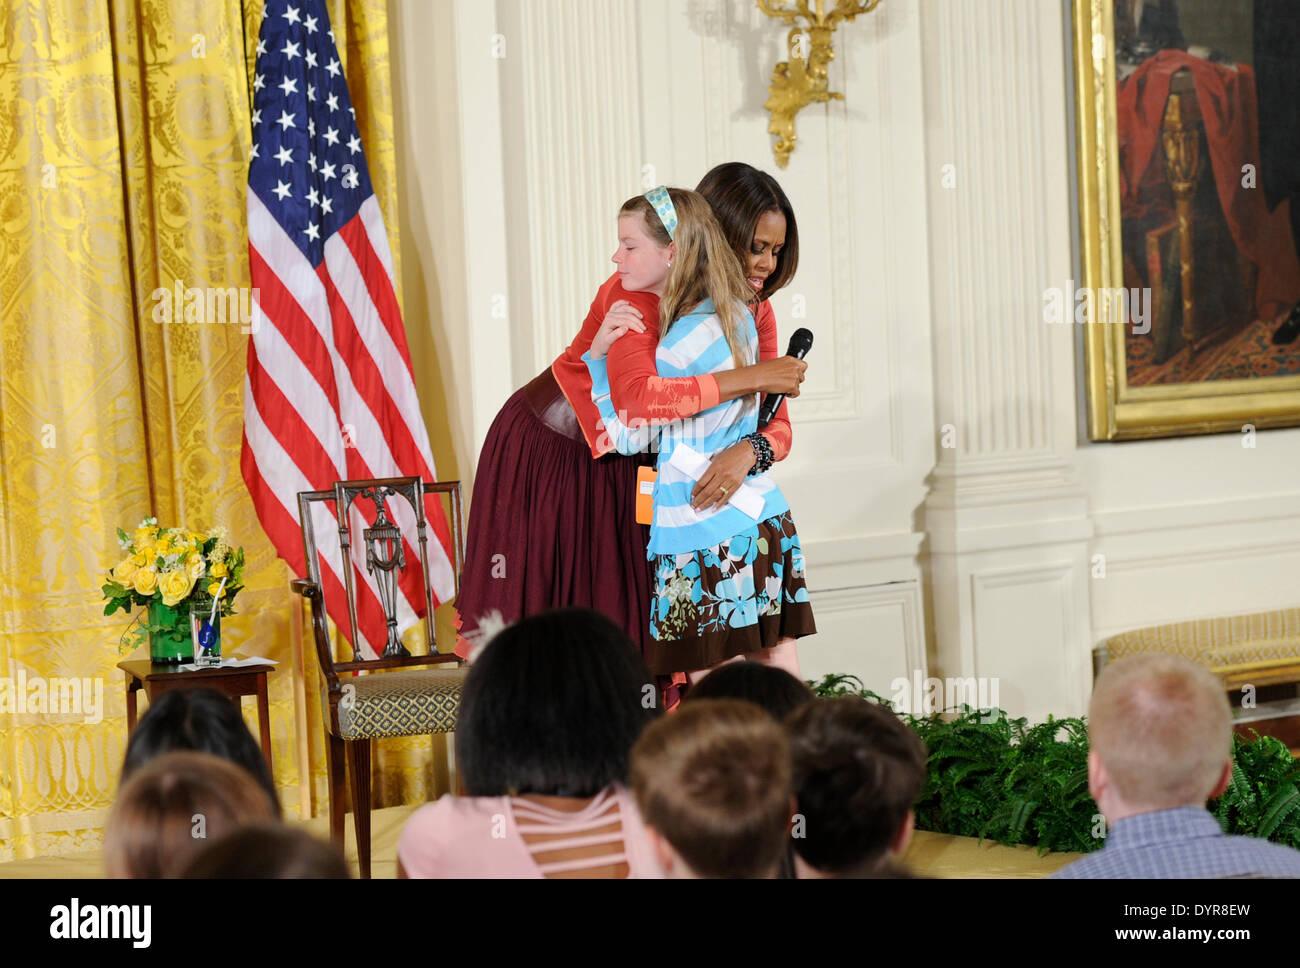 washington usa 24th apr 2014 u s first lady michelle obama hugs